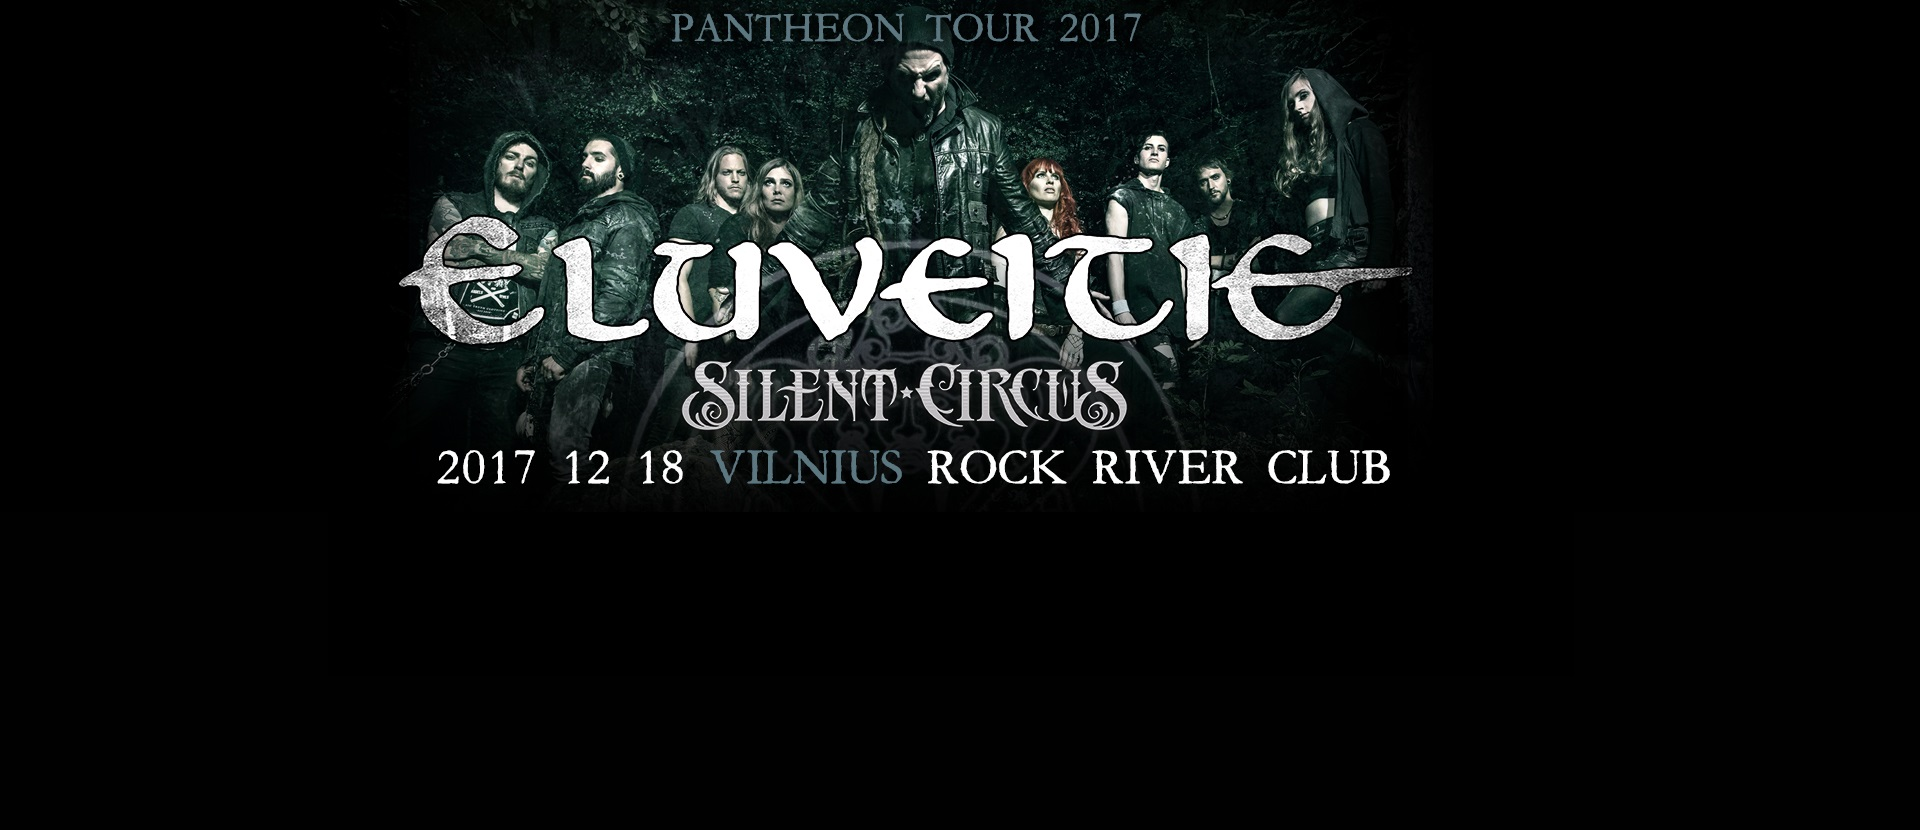 ELUVEITIE - Pantheon Tour 2017